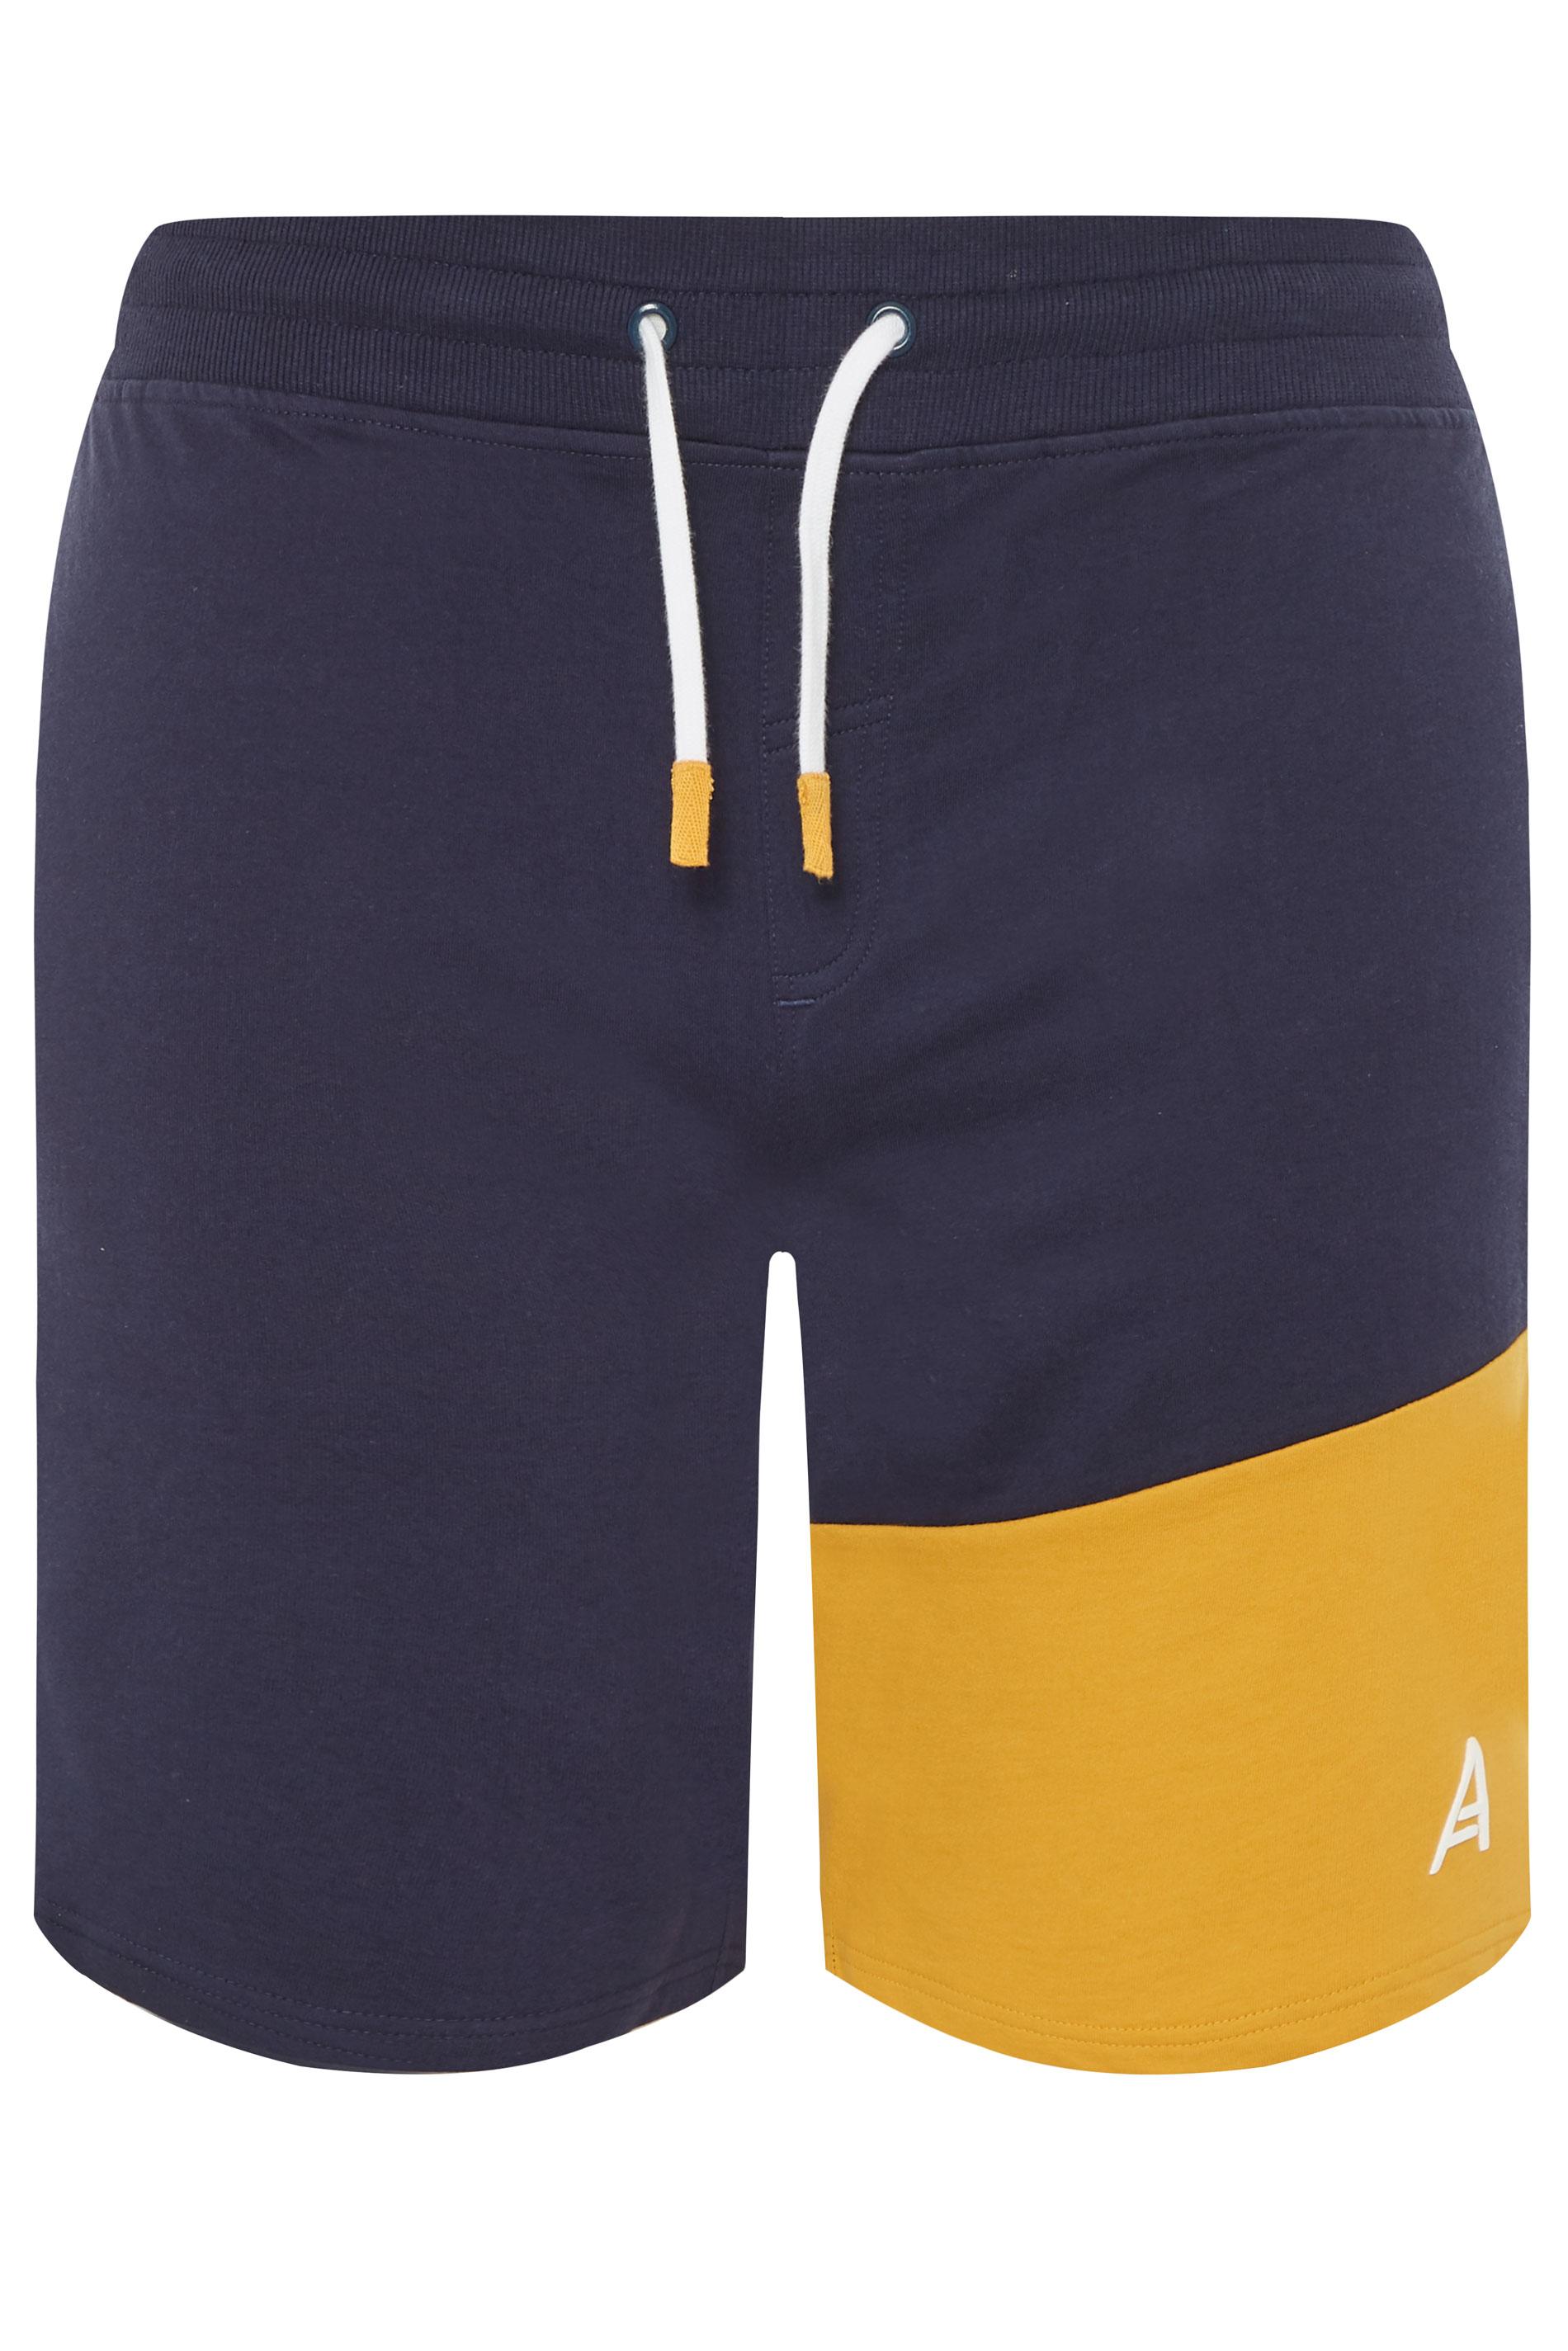 STUDIO A Navy & Yellow Colour Block Shorts